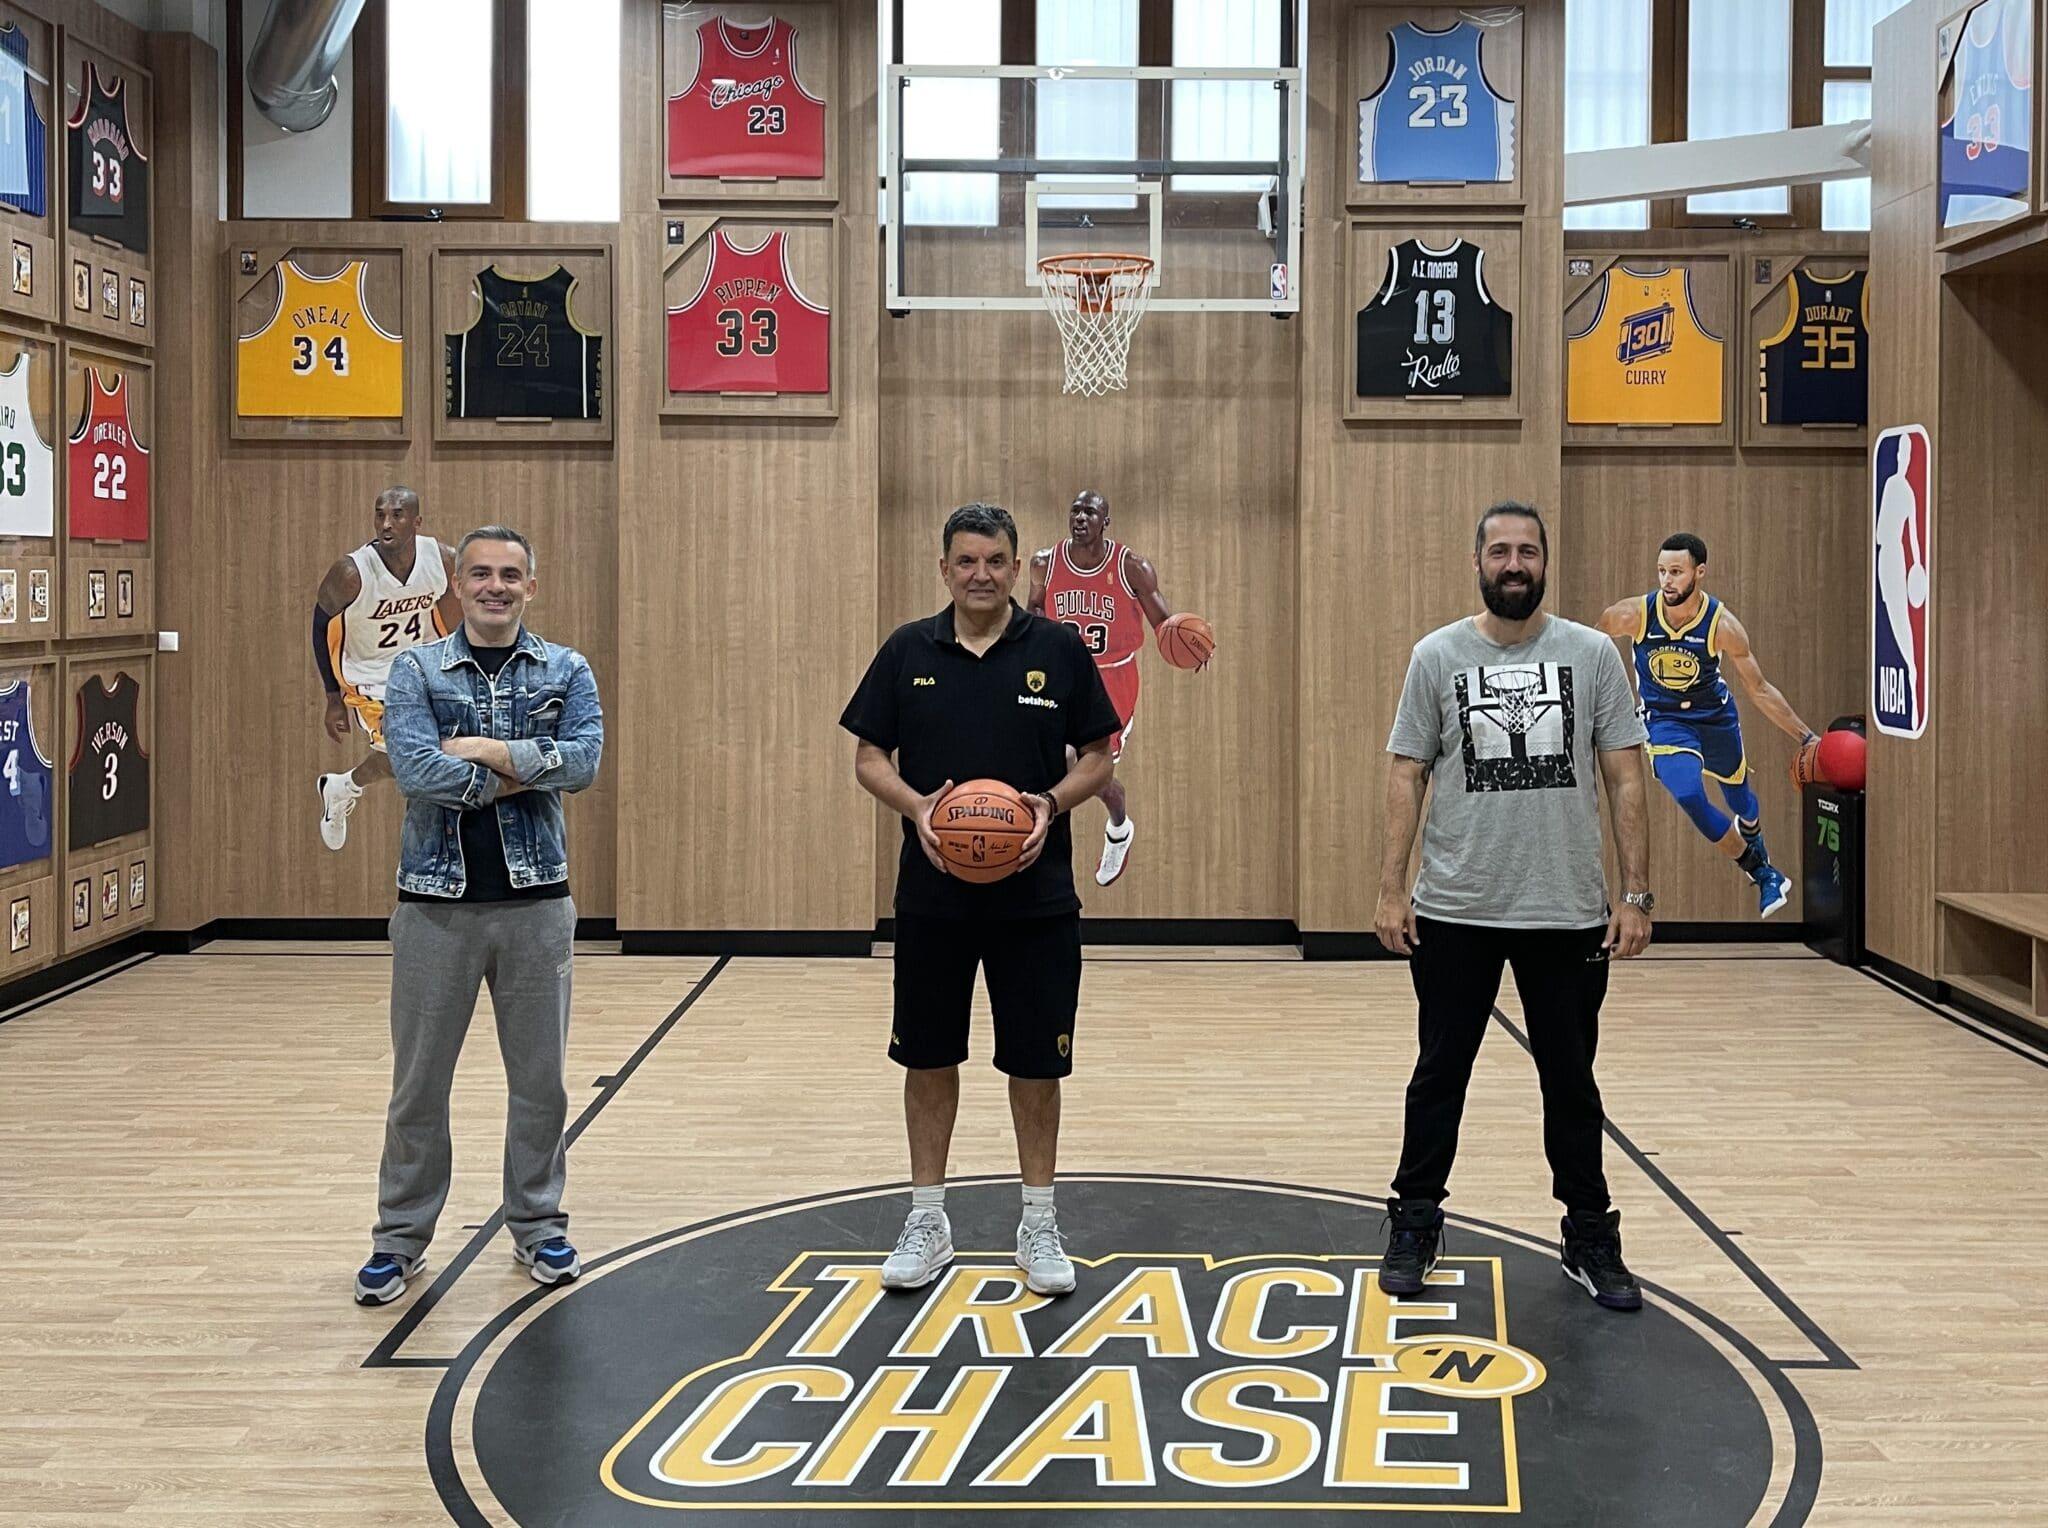 Coach Vangelis Angelou of AEK B.C. talks basketball at Trace 'N Chase